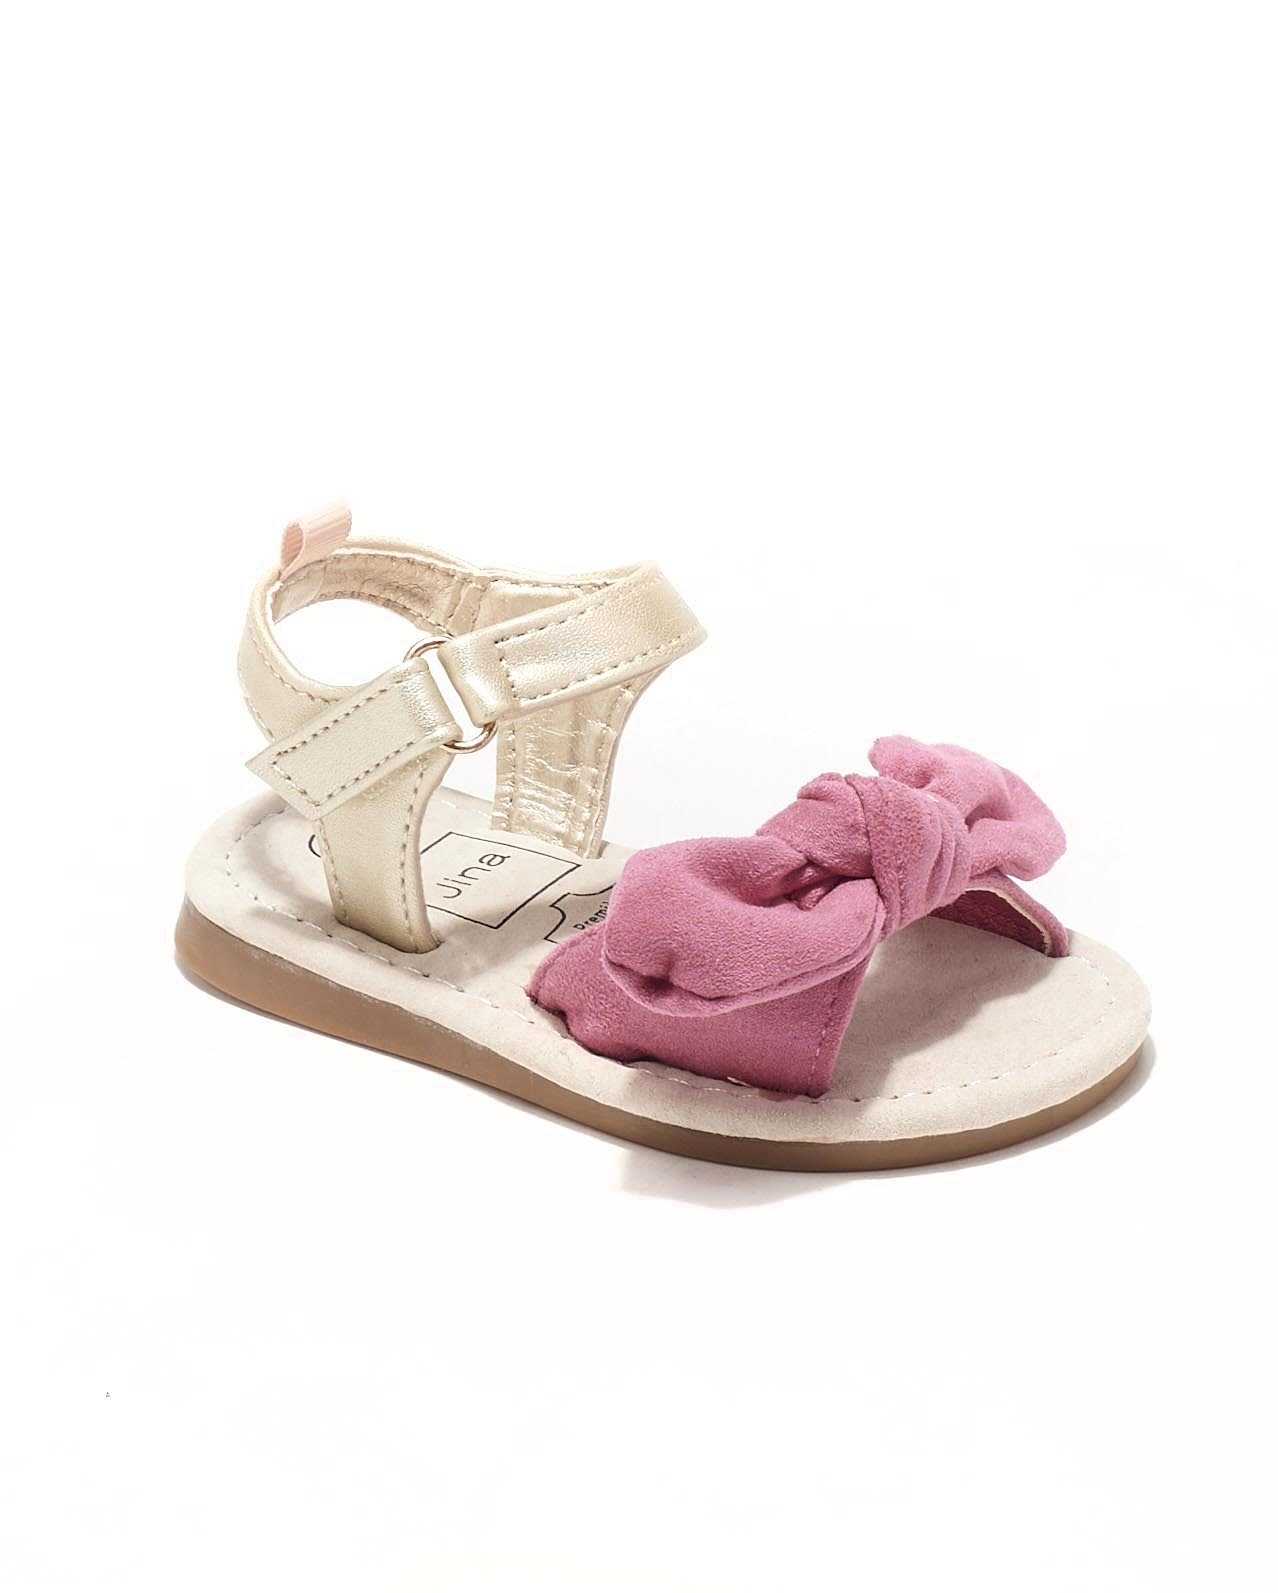 Sandales Bébé Fille - Sandale Ouverte Fuschia Jina - Chickita Baby Style